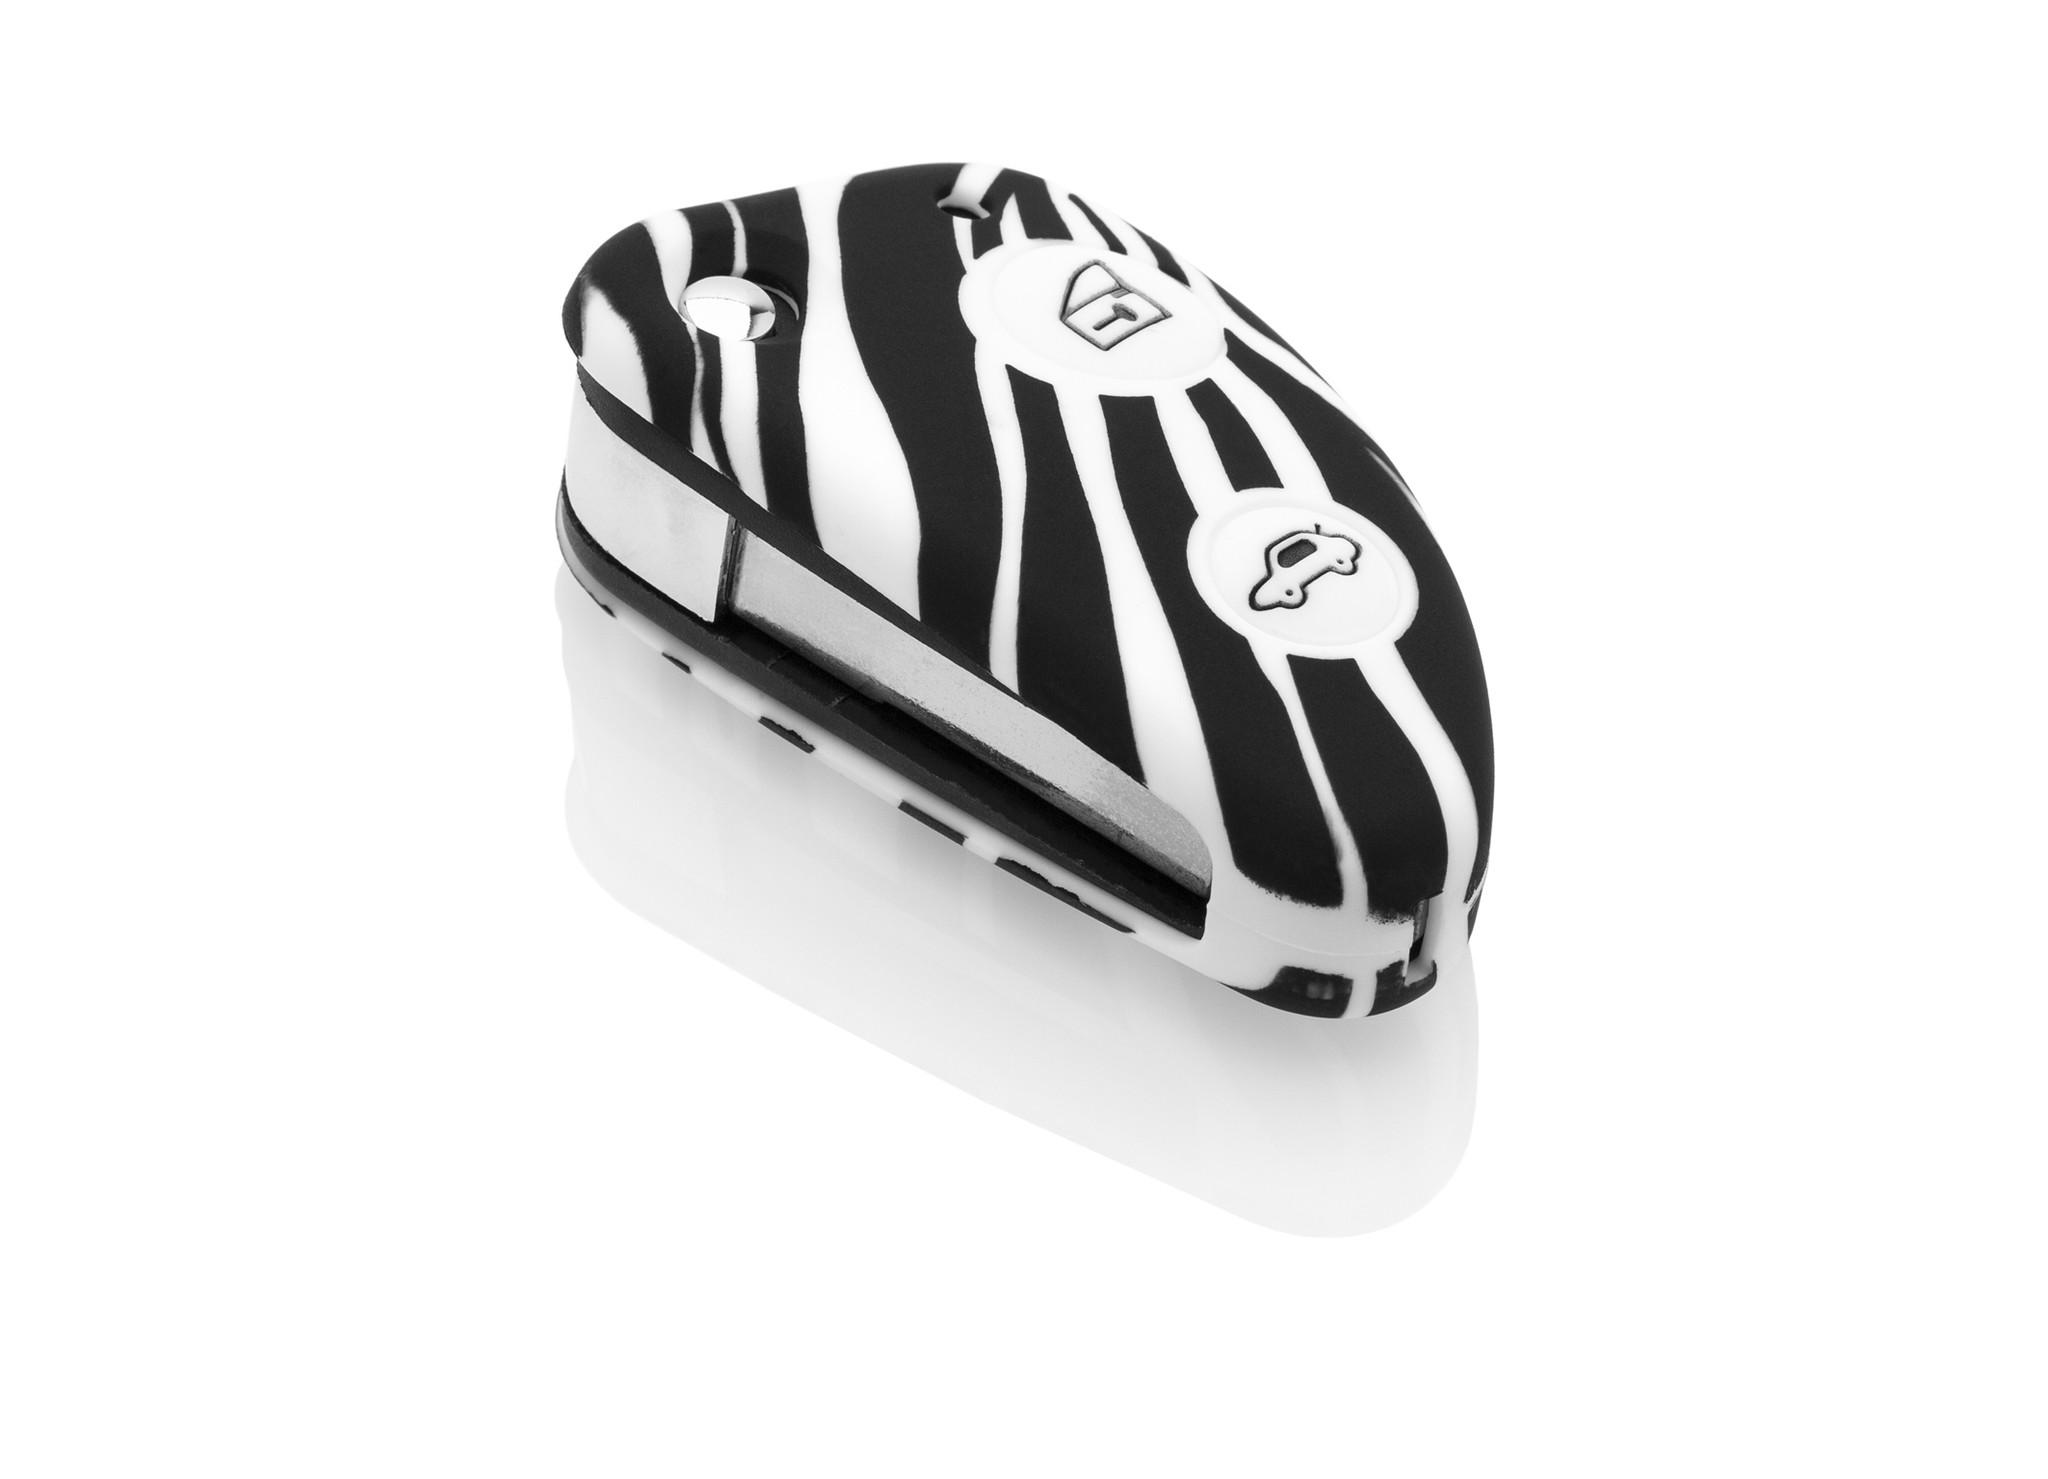 Alfa Romeo Car key cover - Silicone Protective Remote Key Shell - FOB Case Cover - Zebra